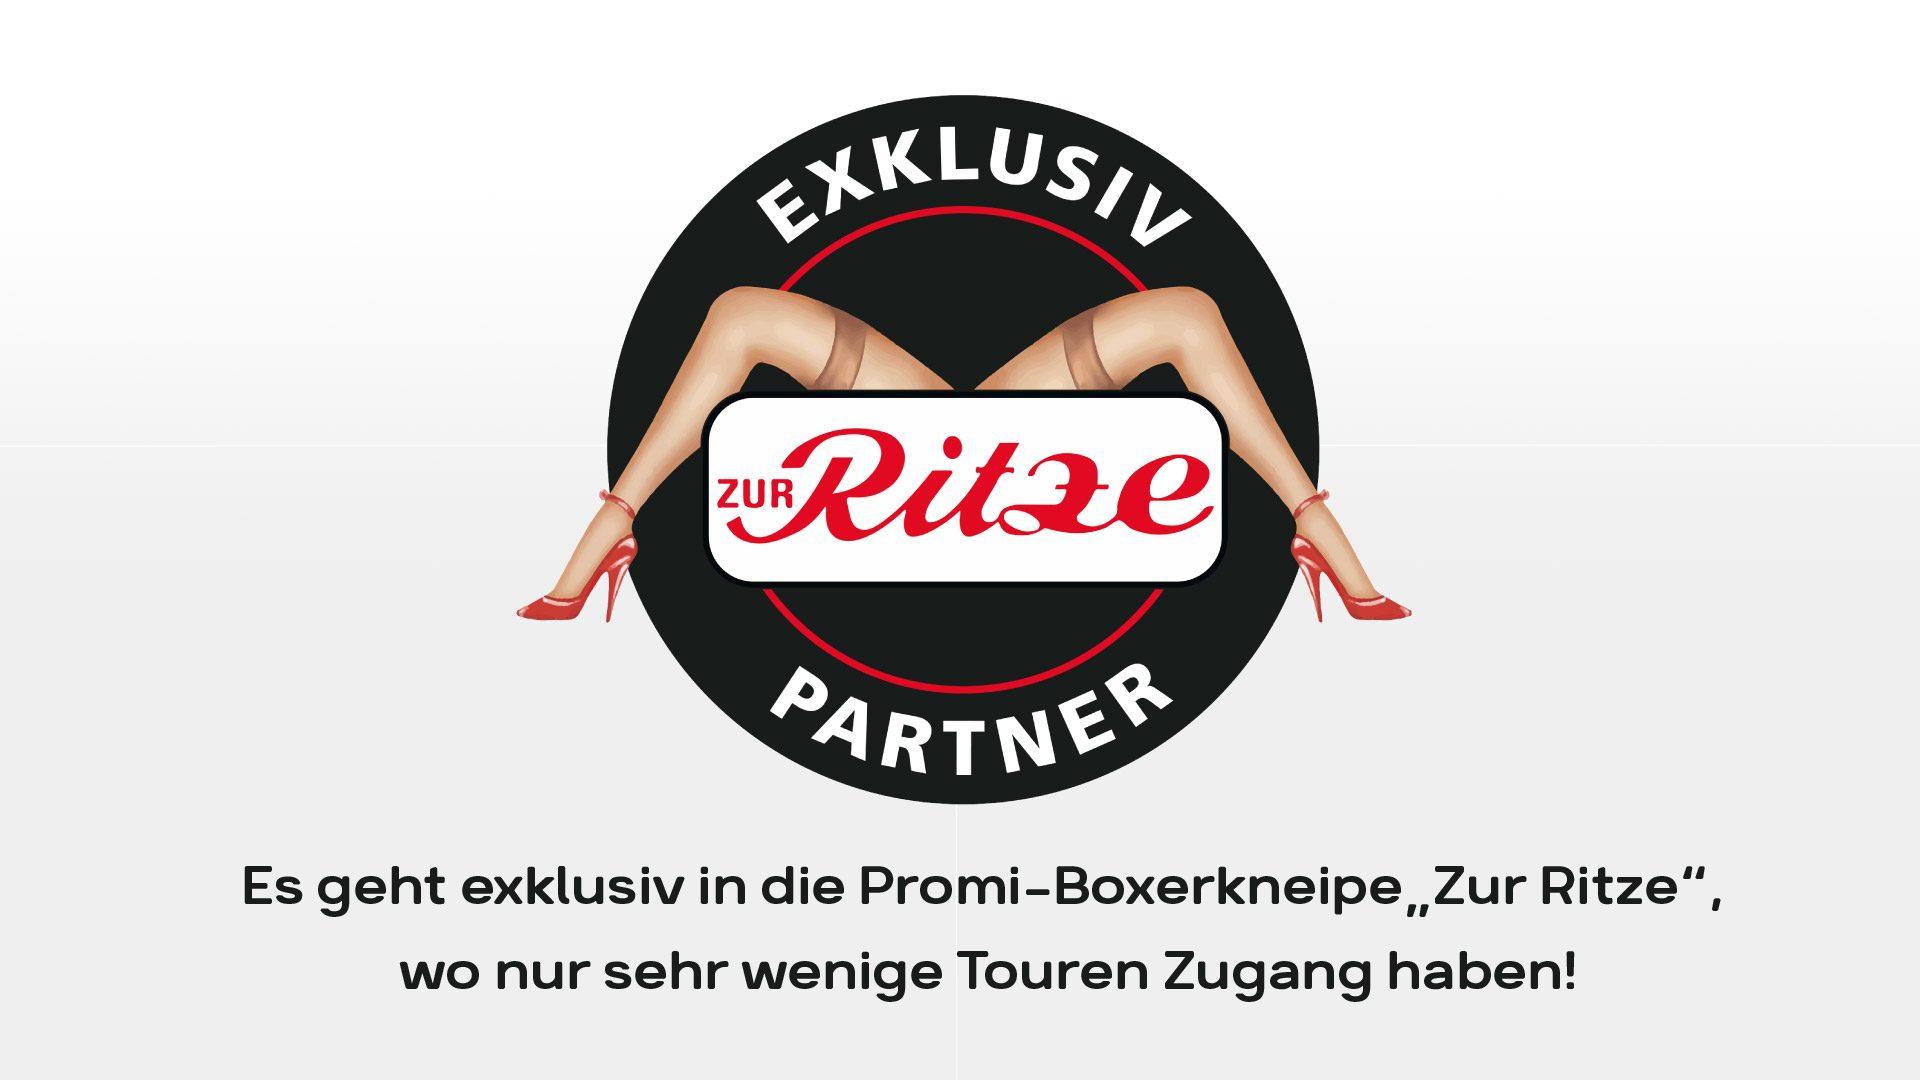 Boxerkneipe Zur Ritze - Exklusiv Partner